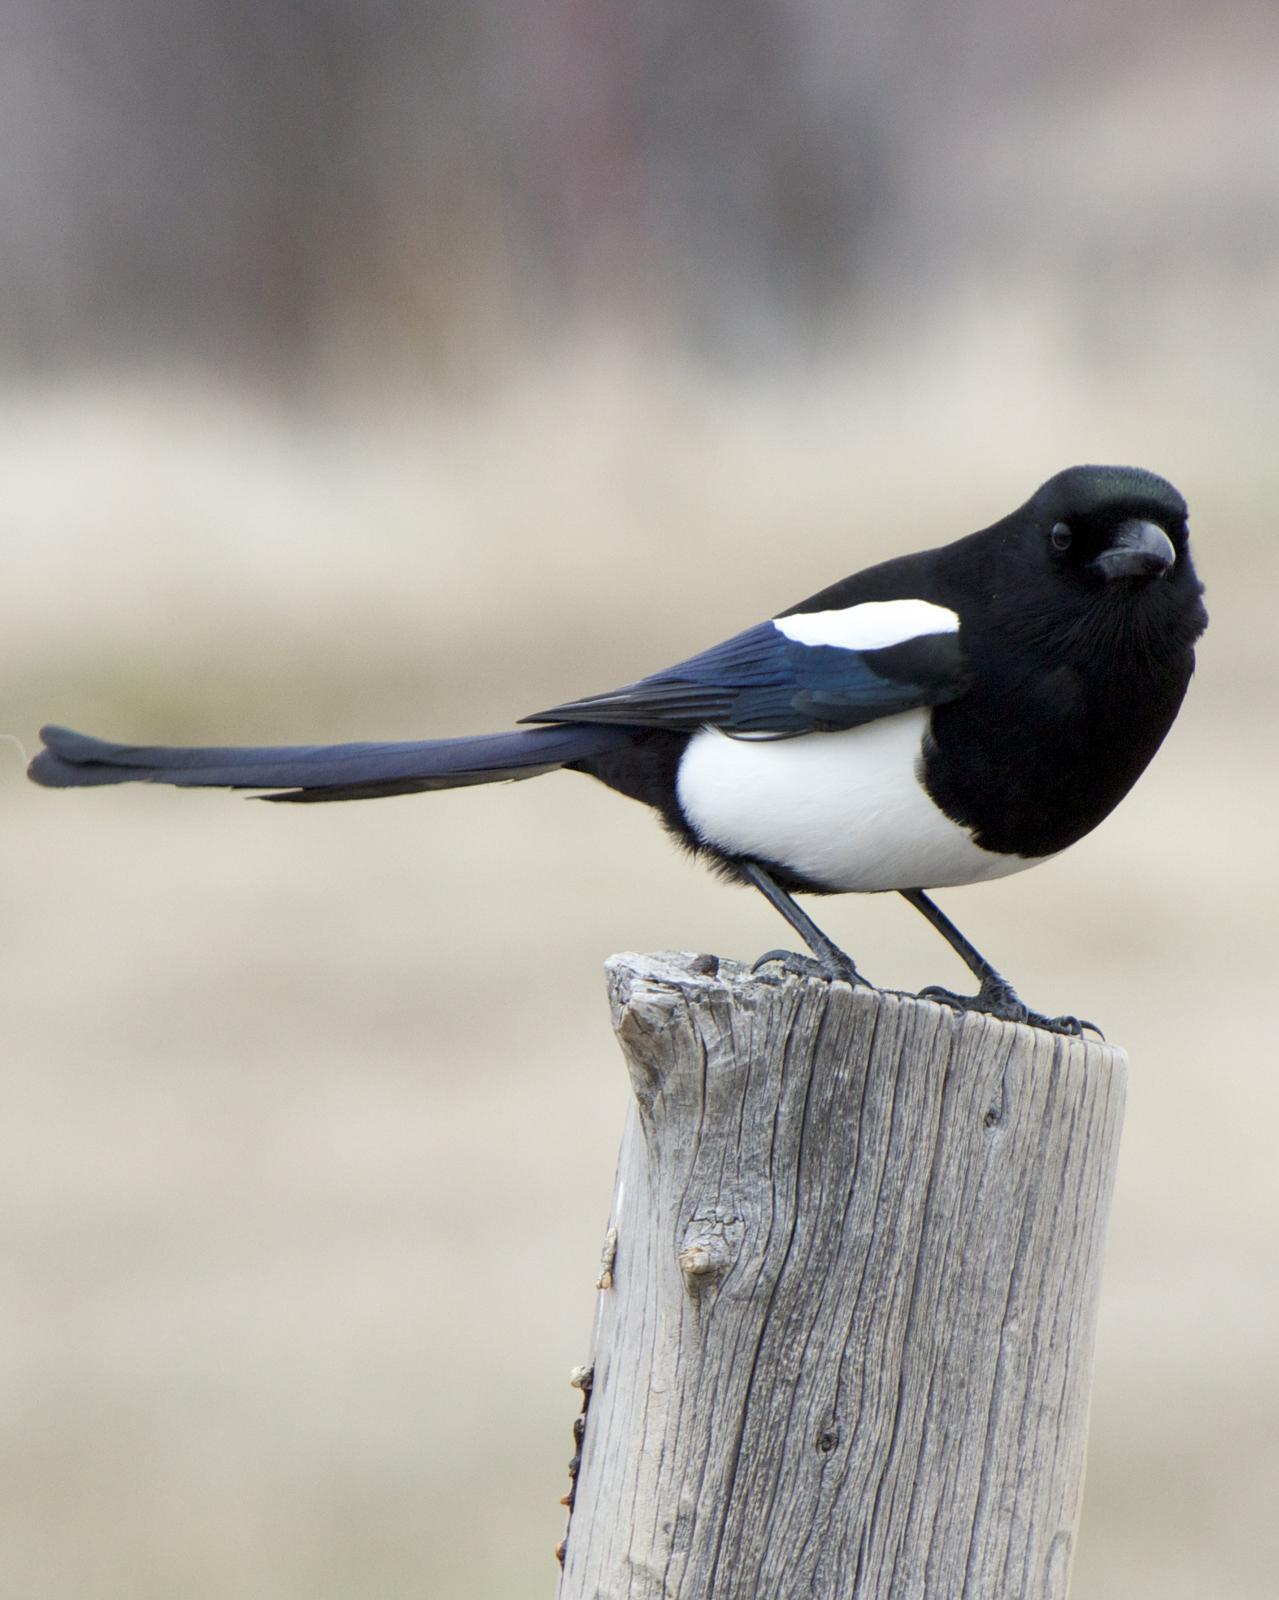 Black-billed Magpie Photo by Mark Baldwin